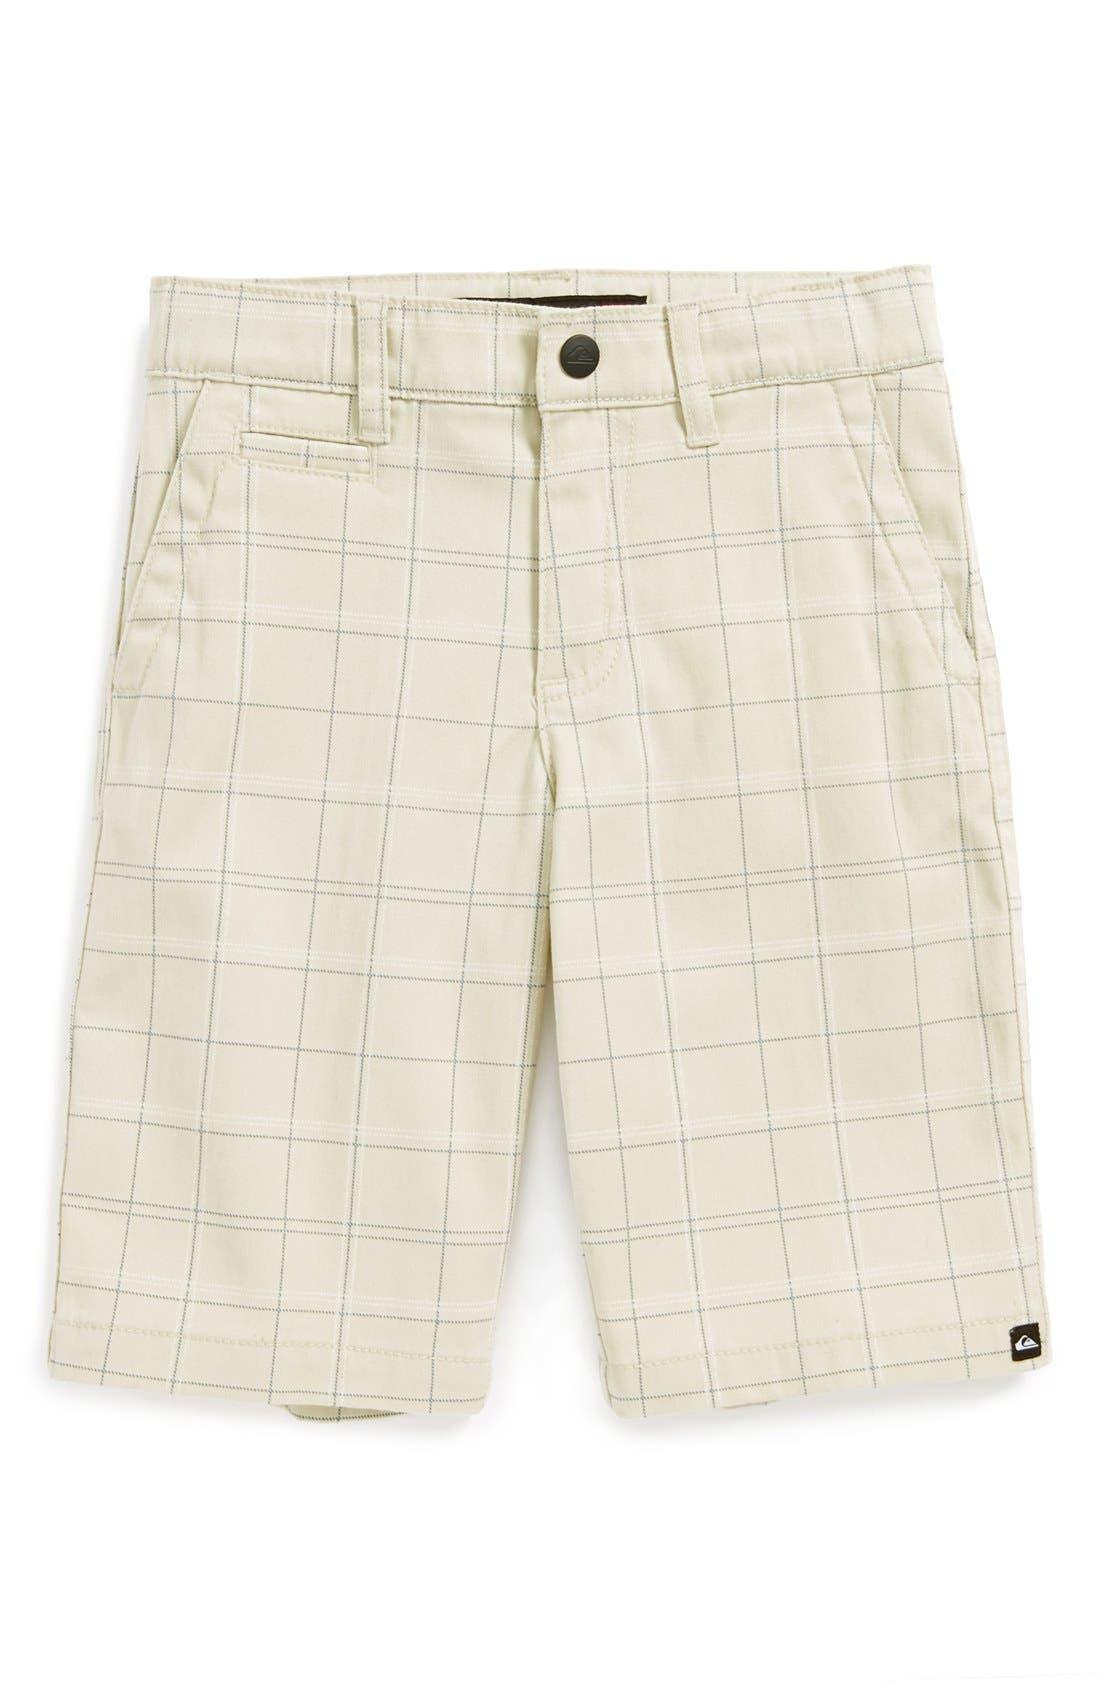 Alternate Image 1 Selected - Quiksilver 'Divided Surplus' Shorts (Big Boys)